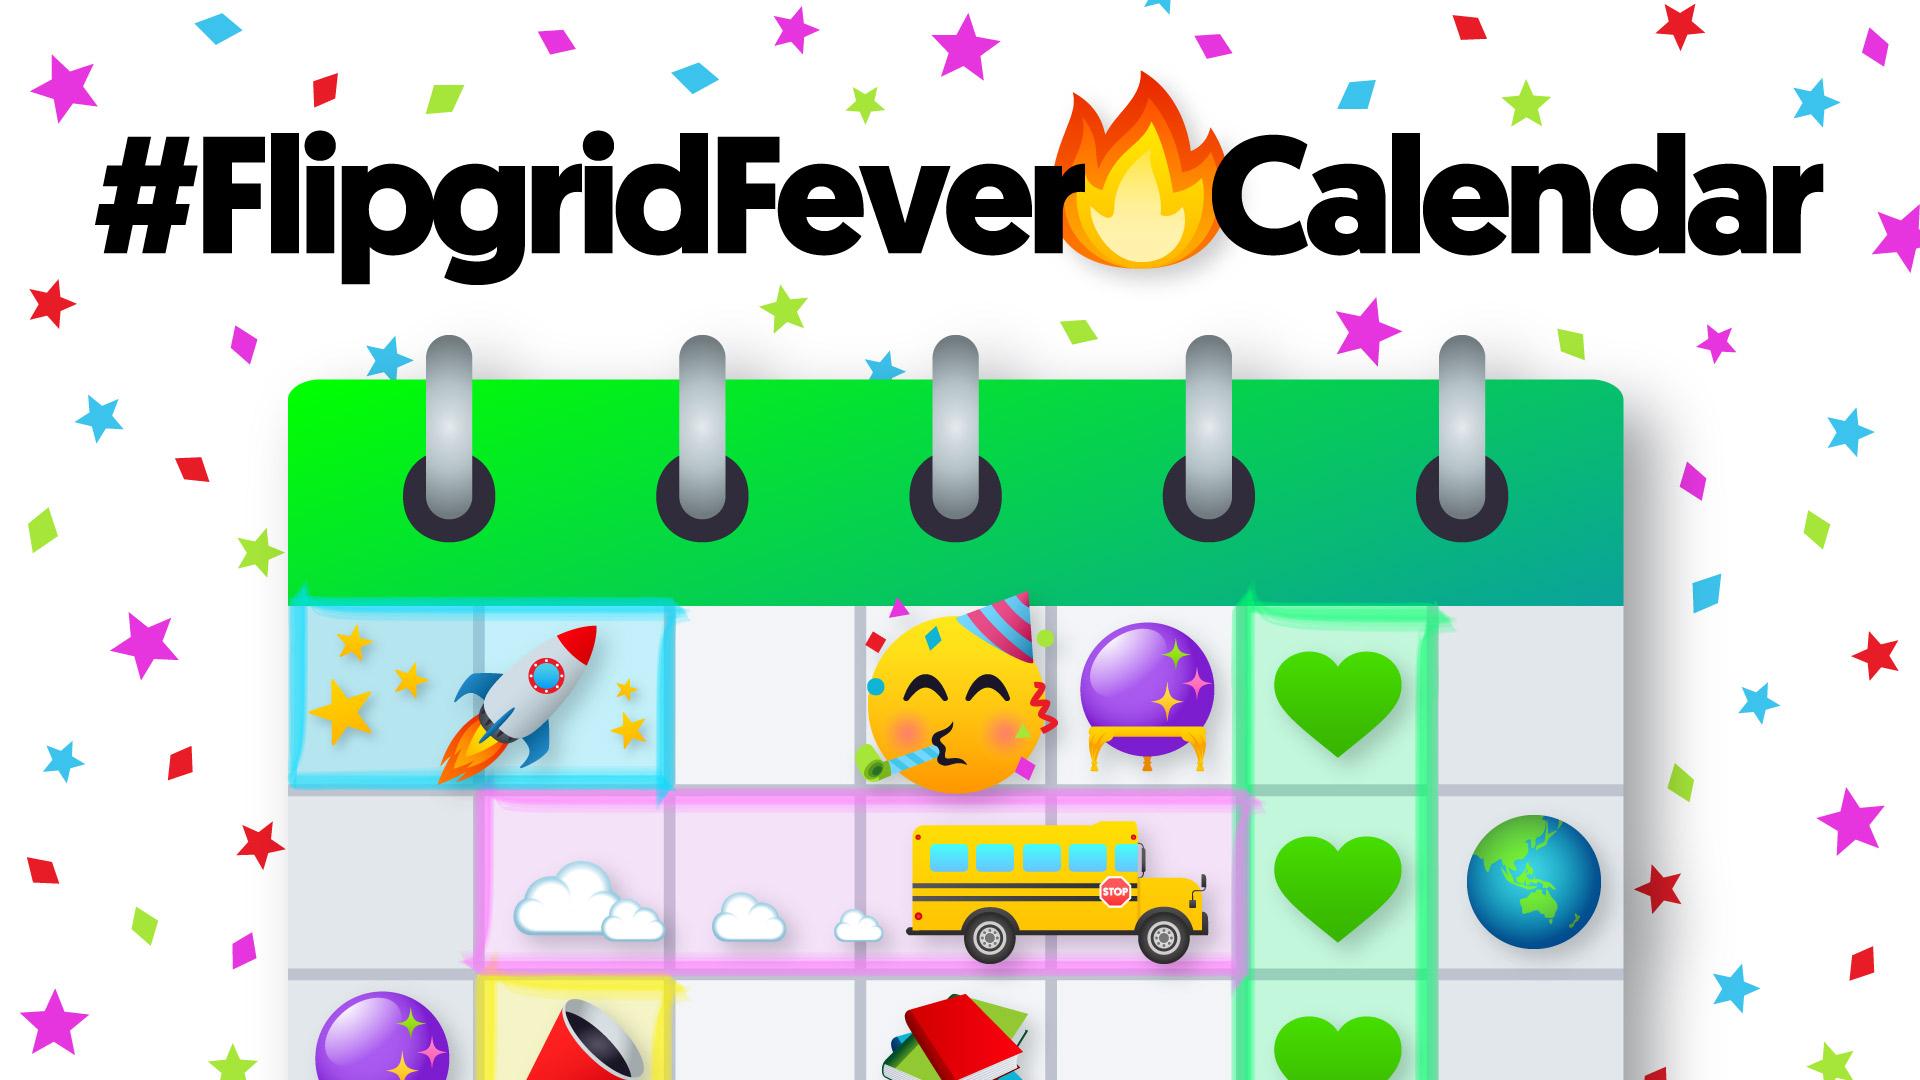 FlipgridFever_Calendar_SG_August2019.jpg